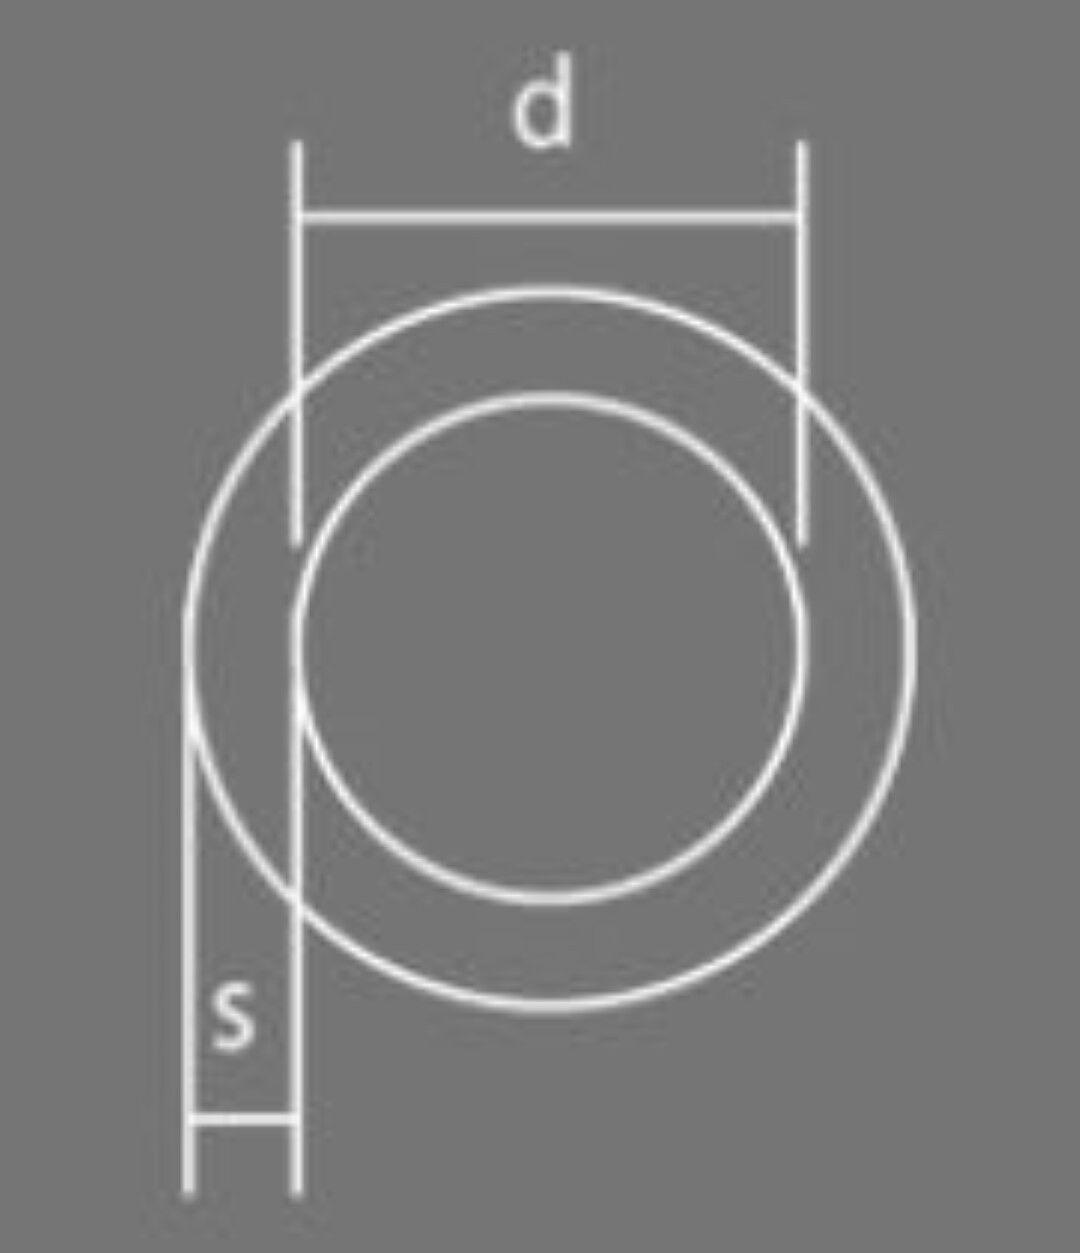 100 x Rundring verzinkt 40 x 4 mm    O-Ring Ringe Ring Rundringe O-Ringe 4d0ef6